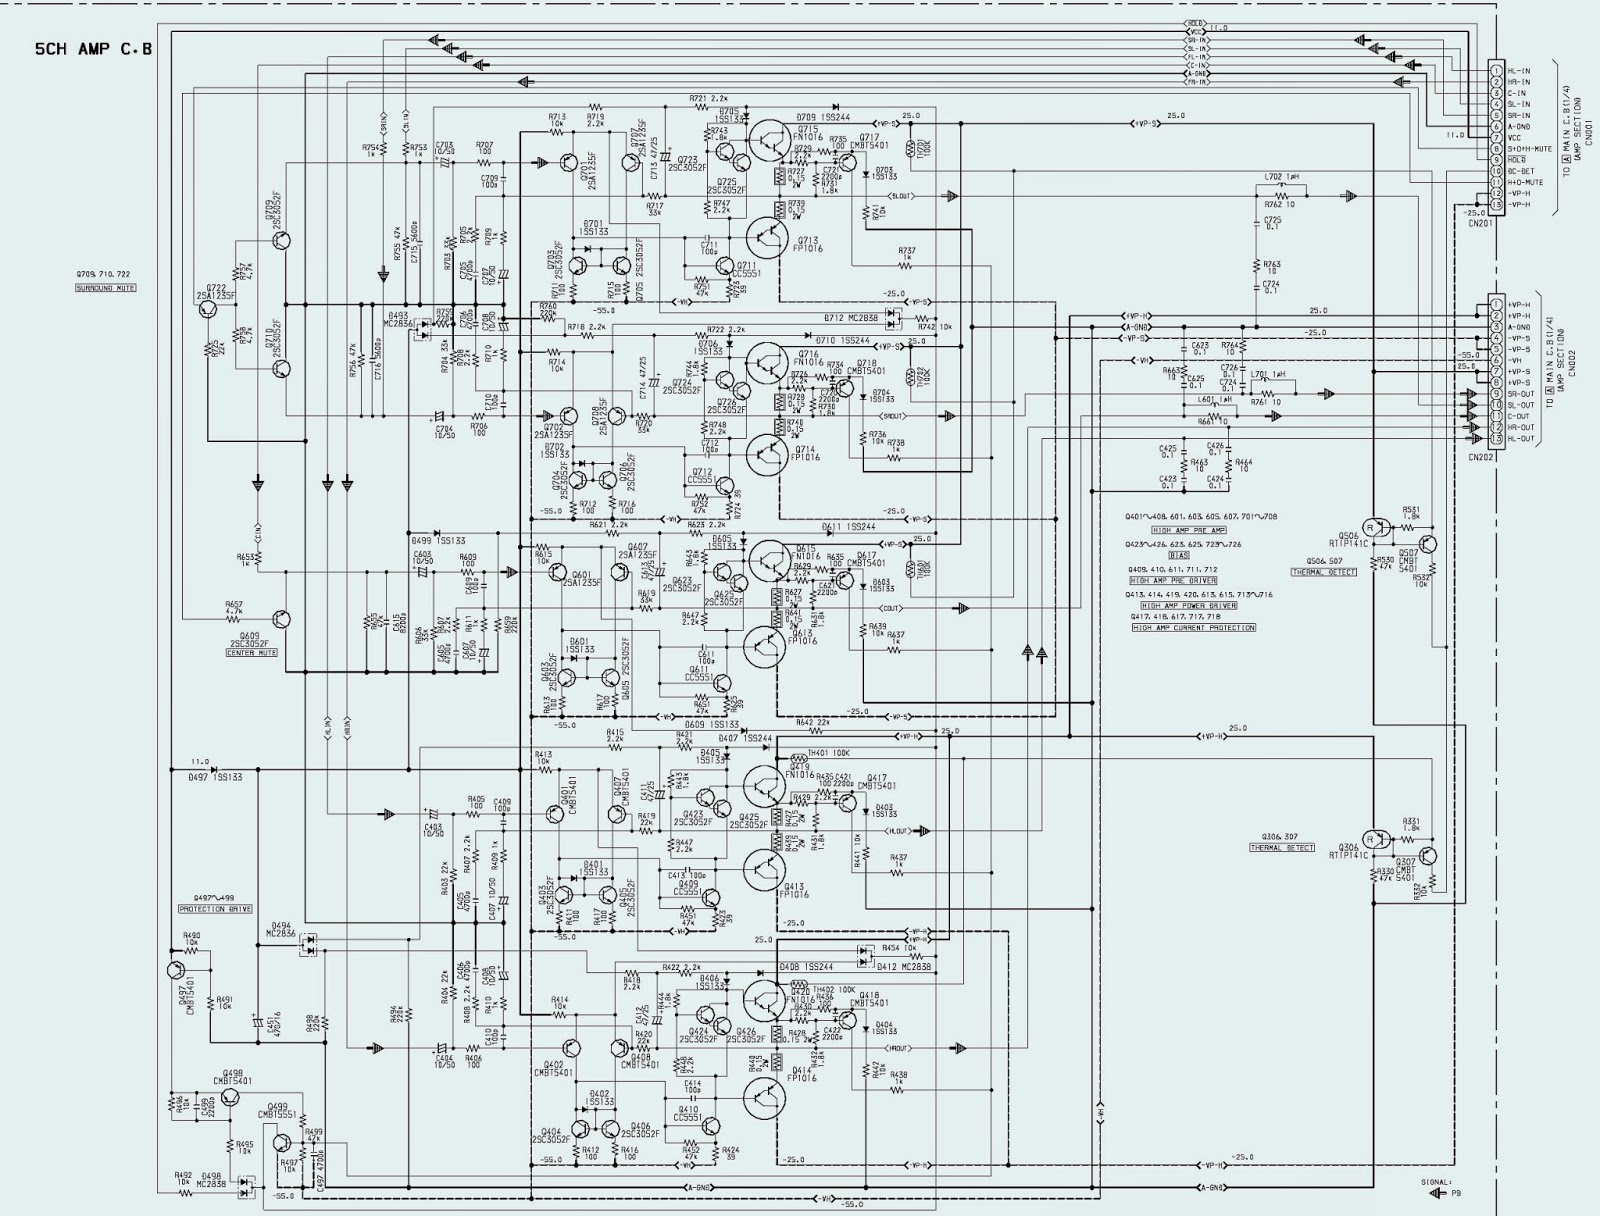 aiwa stereo wiring diagram schema wiring diagramvarious diagram aiwa xh a1060 compact disc stereo system schematics [ 1600 x 1216 Pixel ]